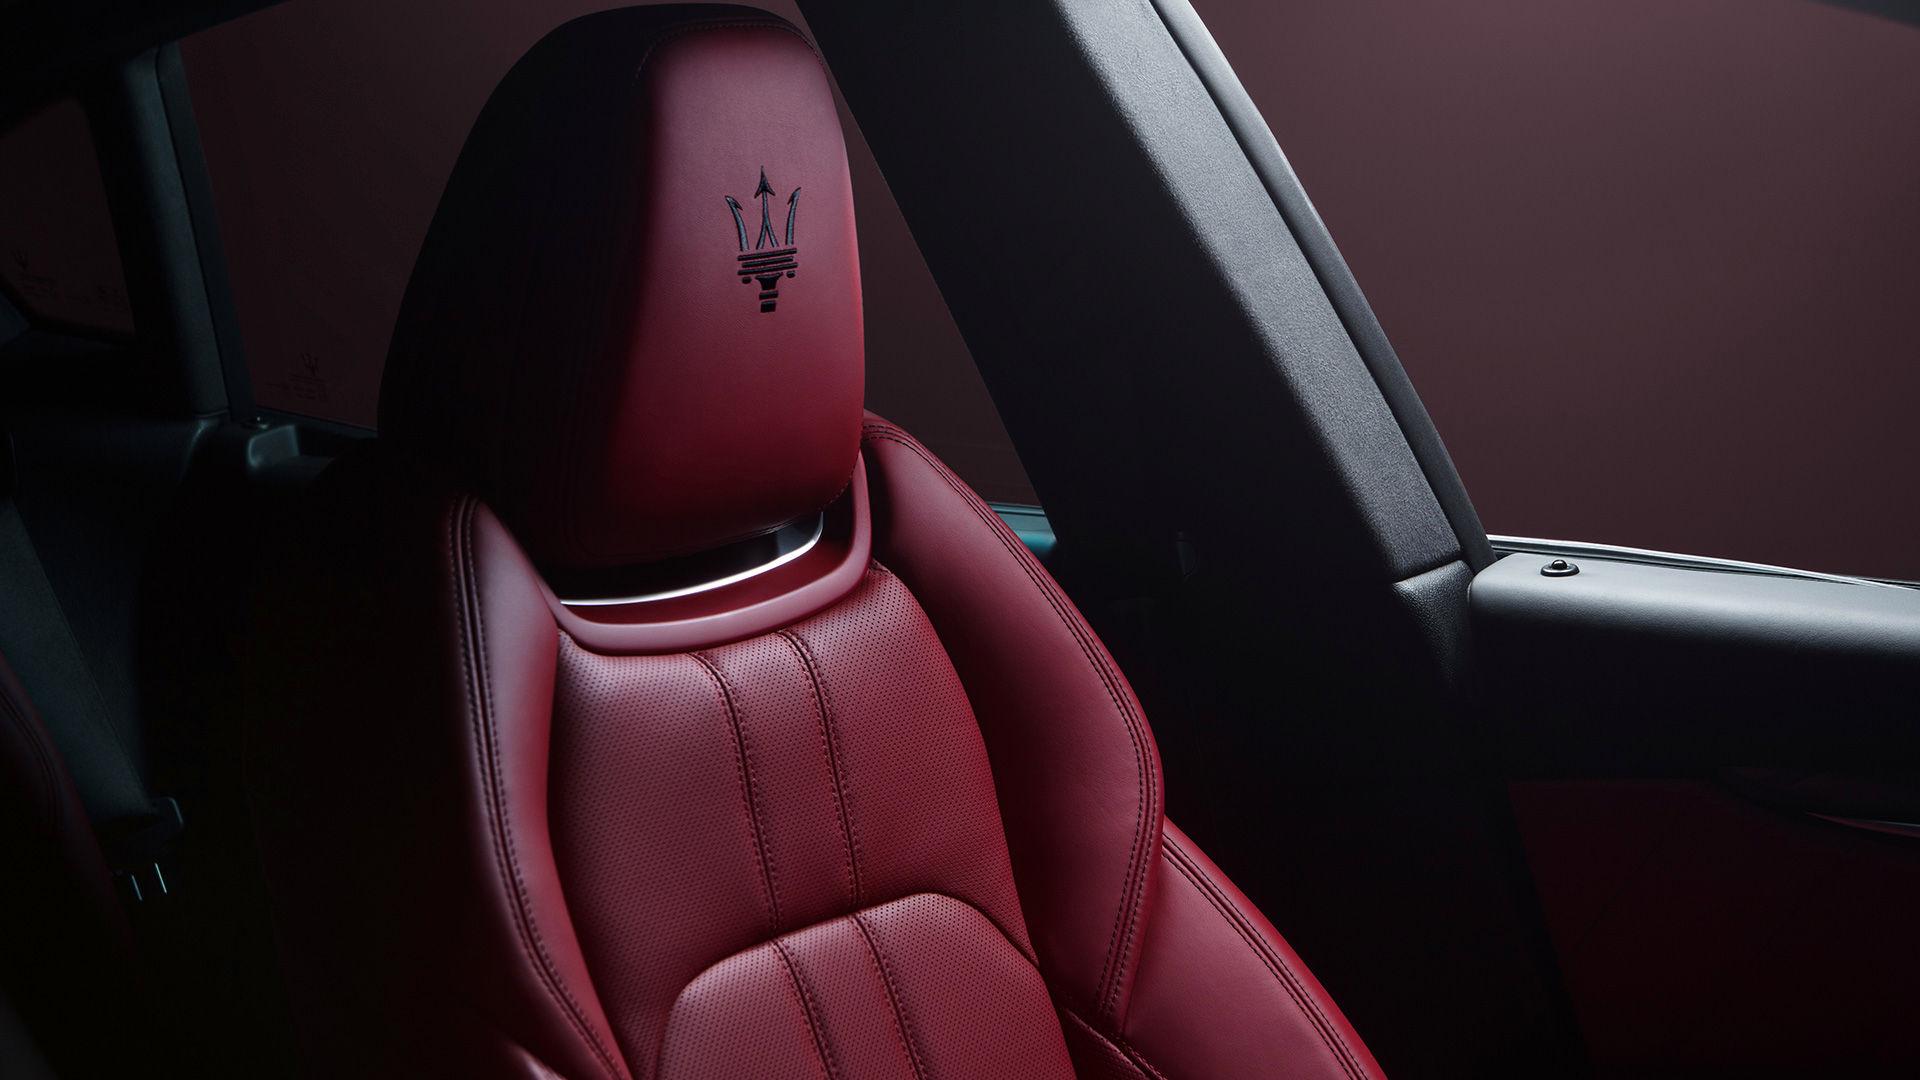 Maserati Levante - Roter Ledersitz